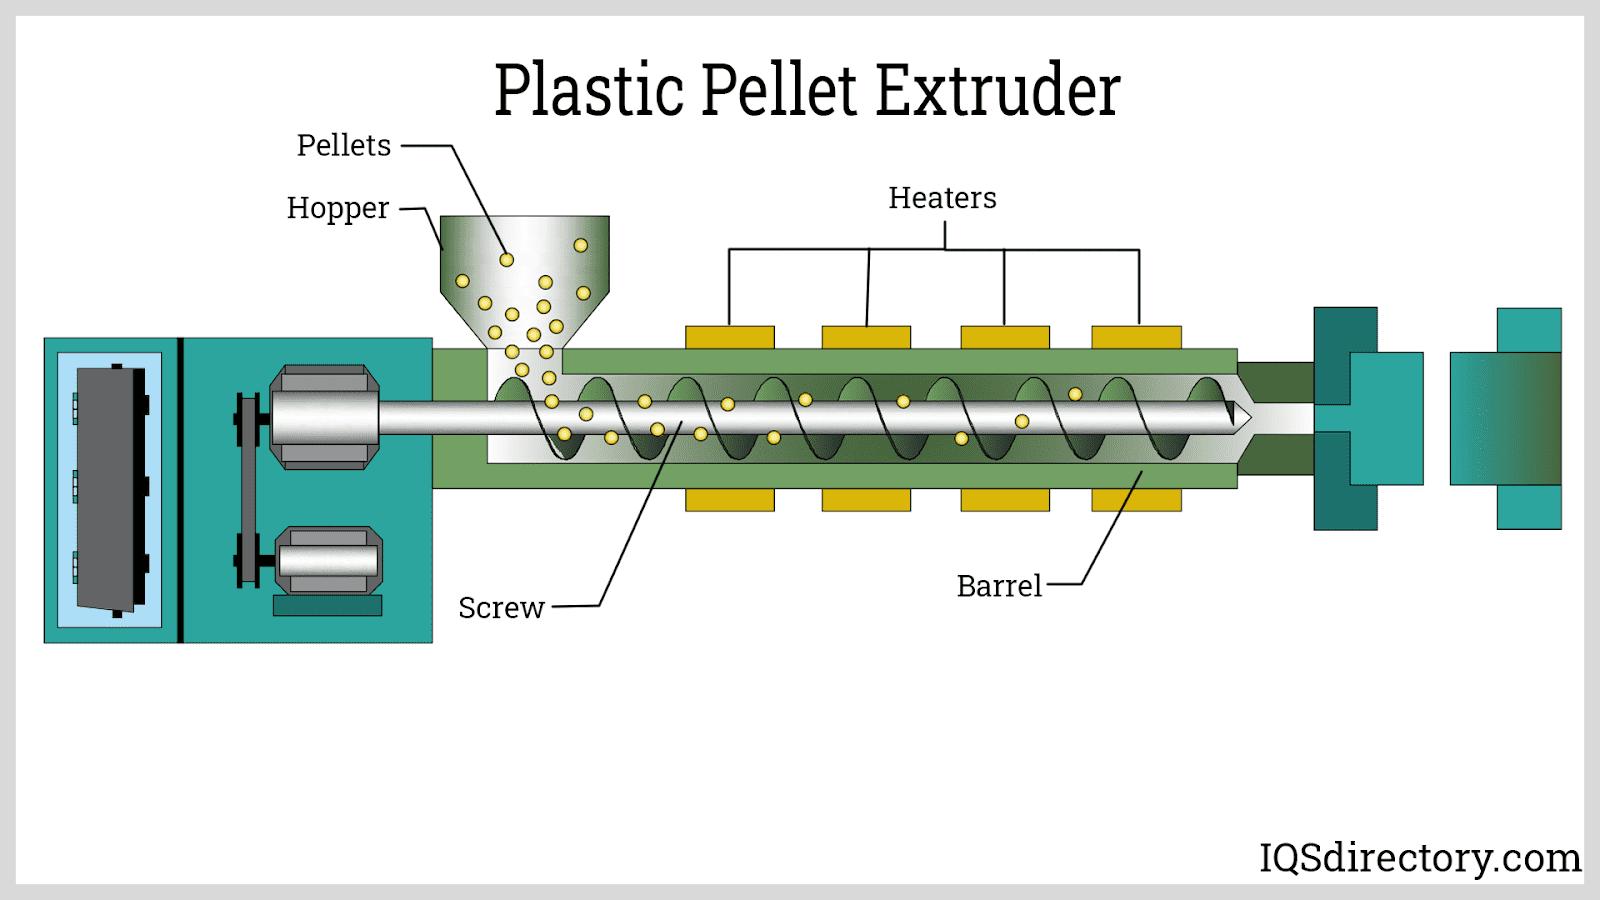 Plastic Pellet Extruder